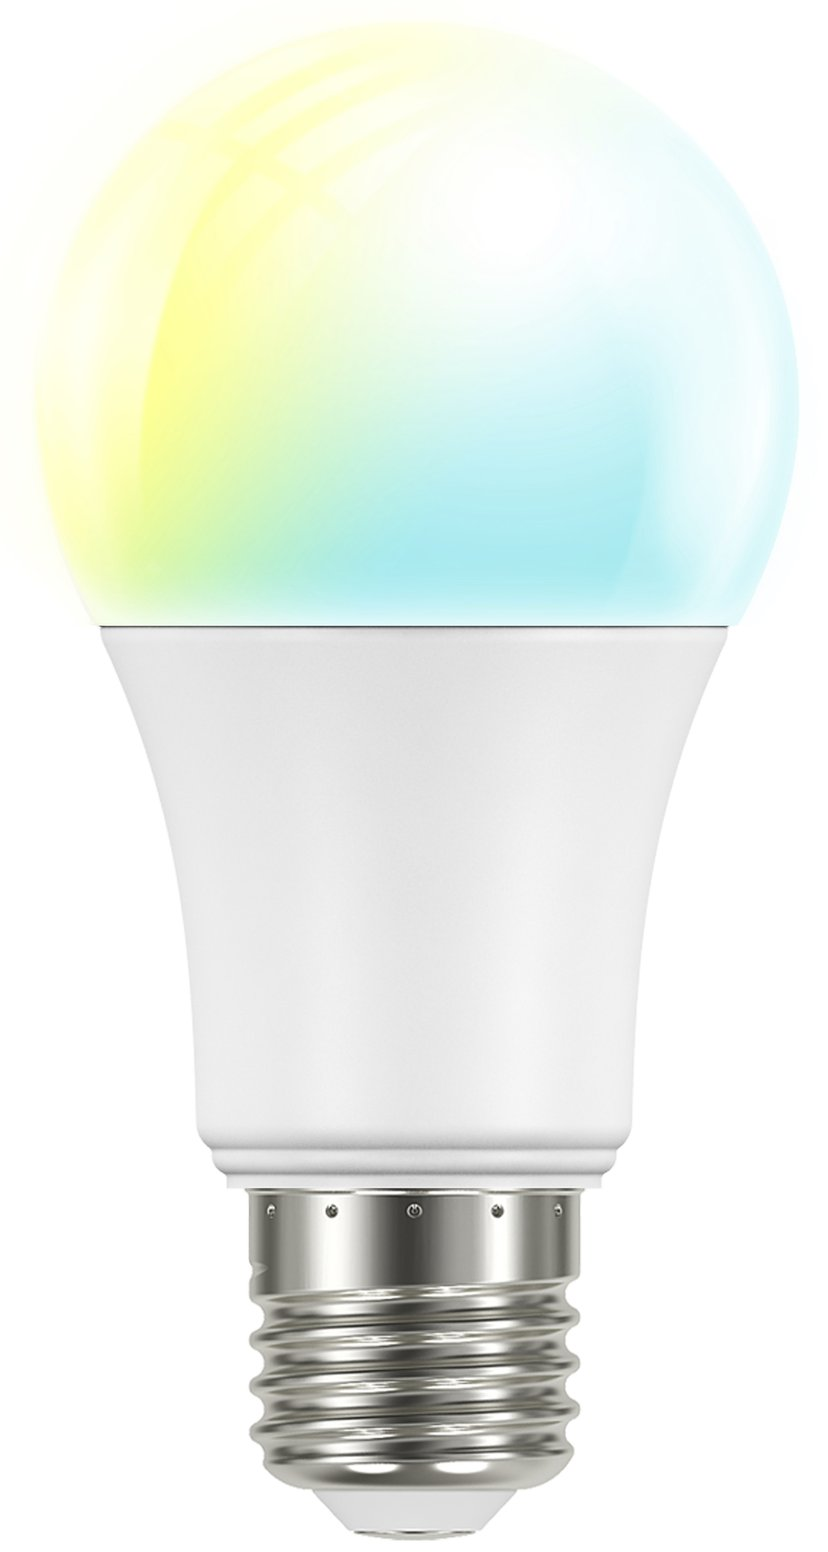 Smartline Flow Lamp E27 9W Dimmable Warm/Cool